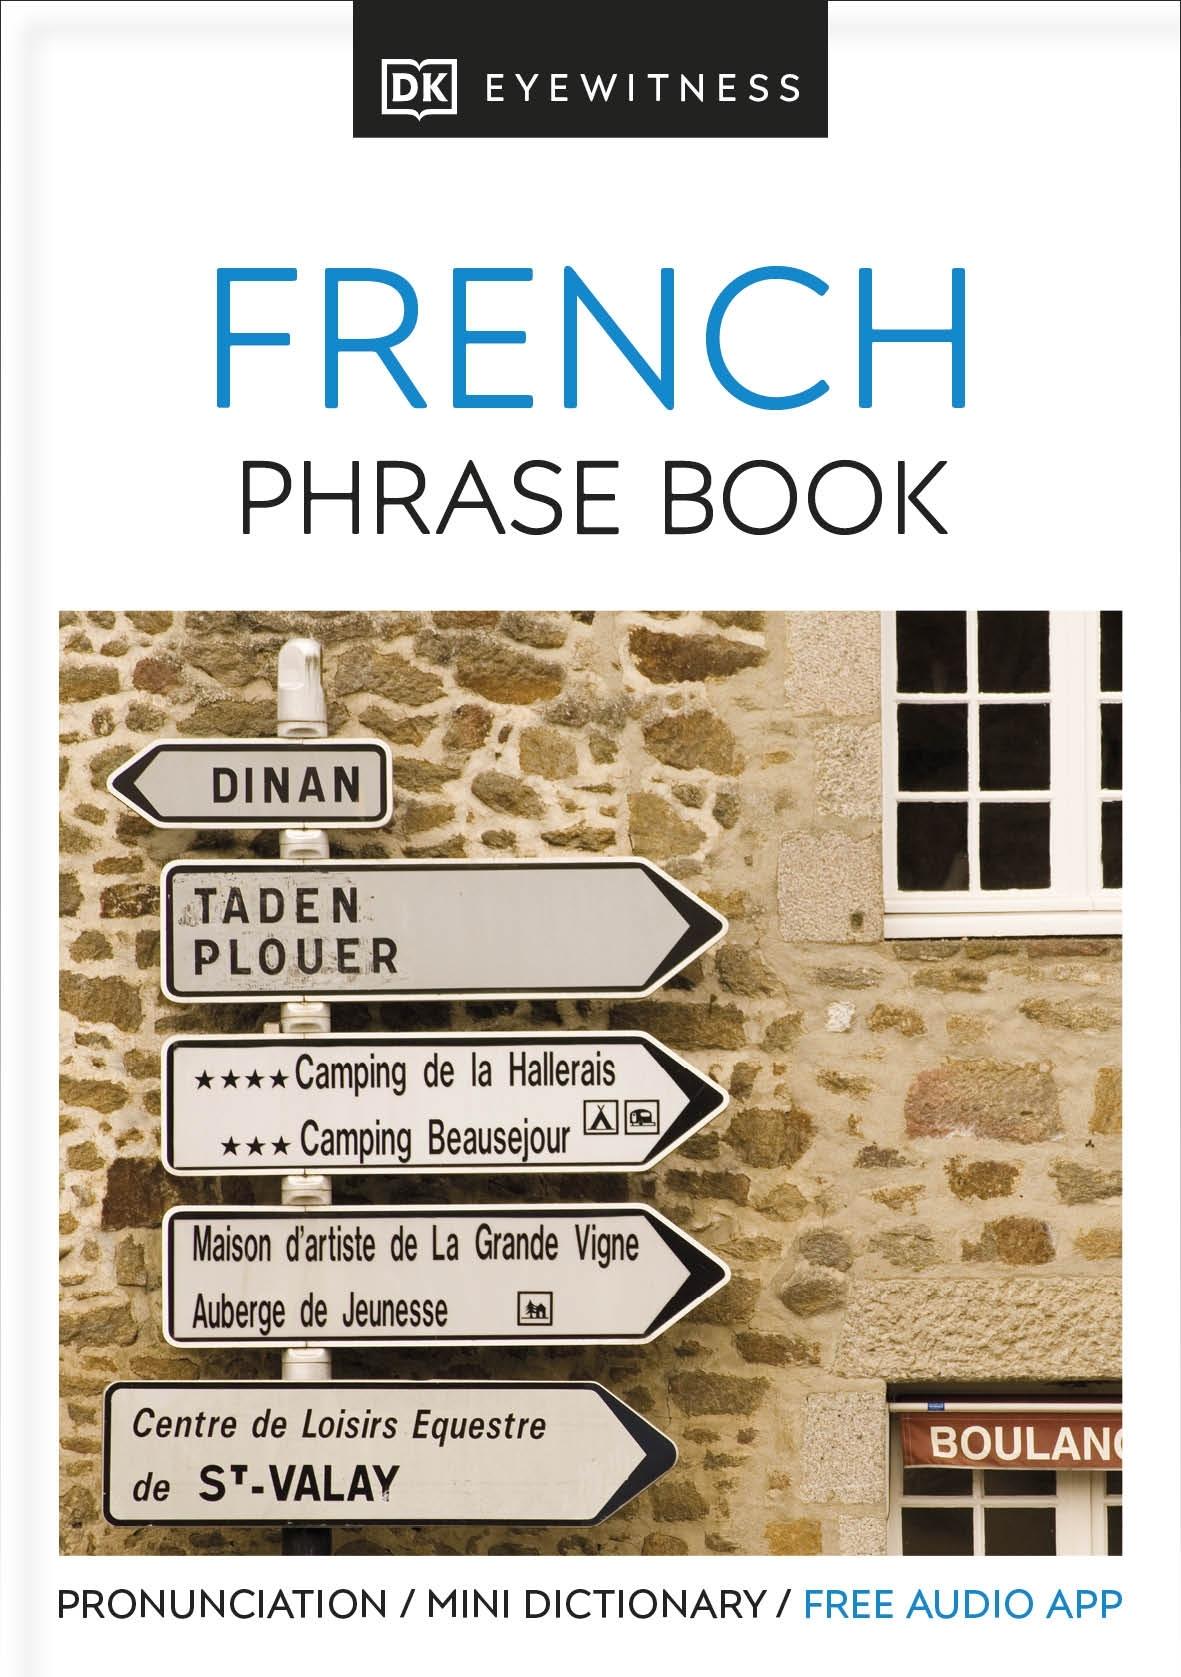 French Phrase Book: Eyewitness Travel by DK - Penguin Books Australia